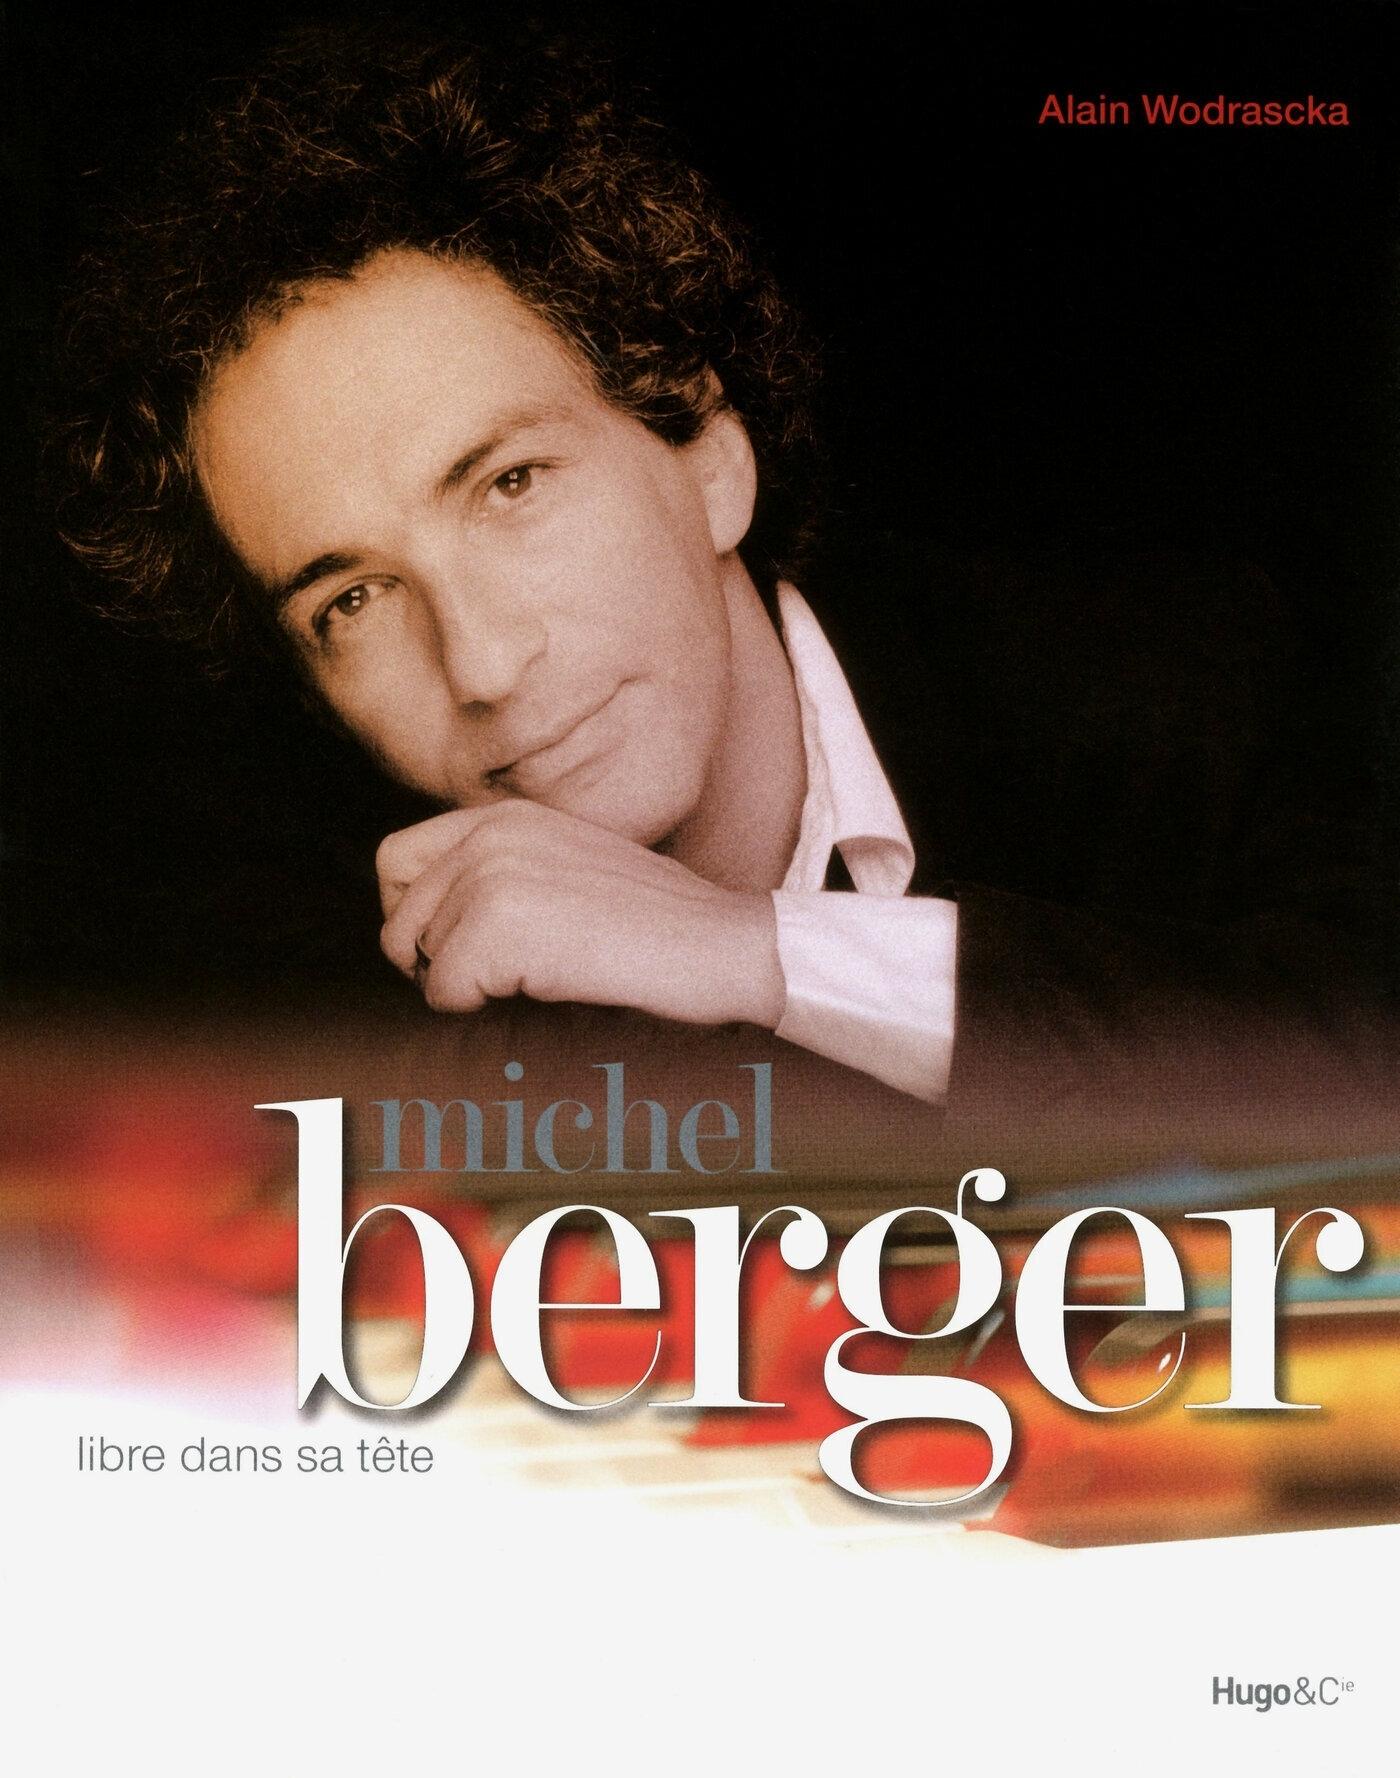 MICHEL BERGER, LIBRE DANS SA TETE